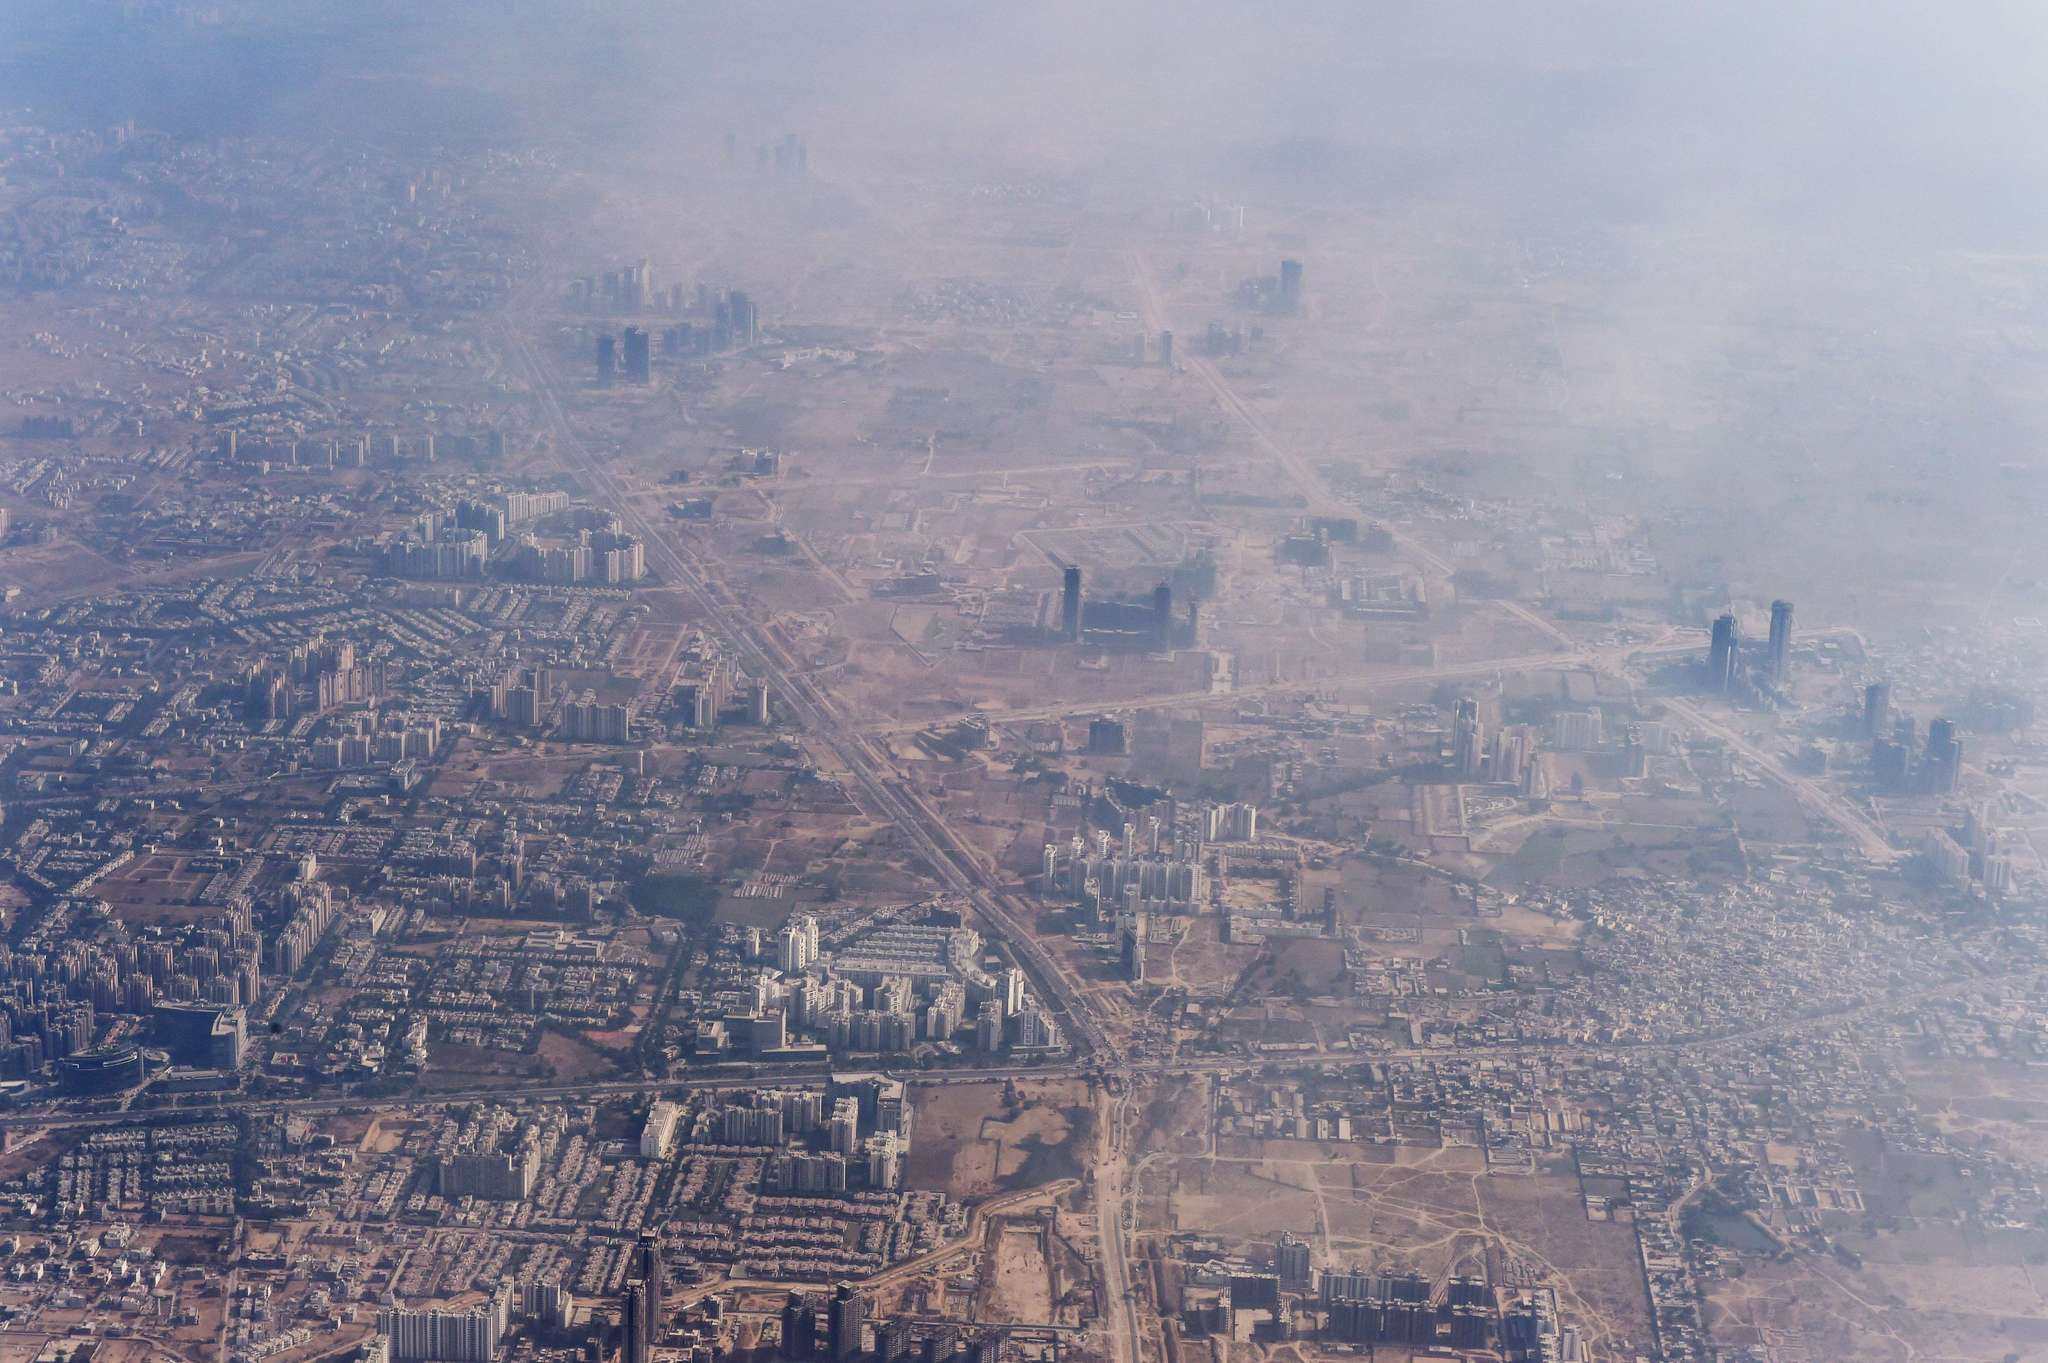 'Desperate environmentalism' won't save the environment